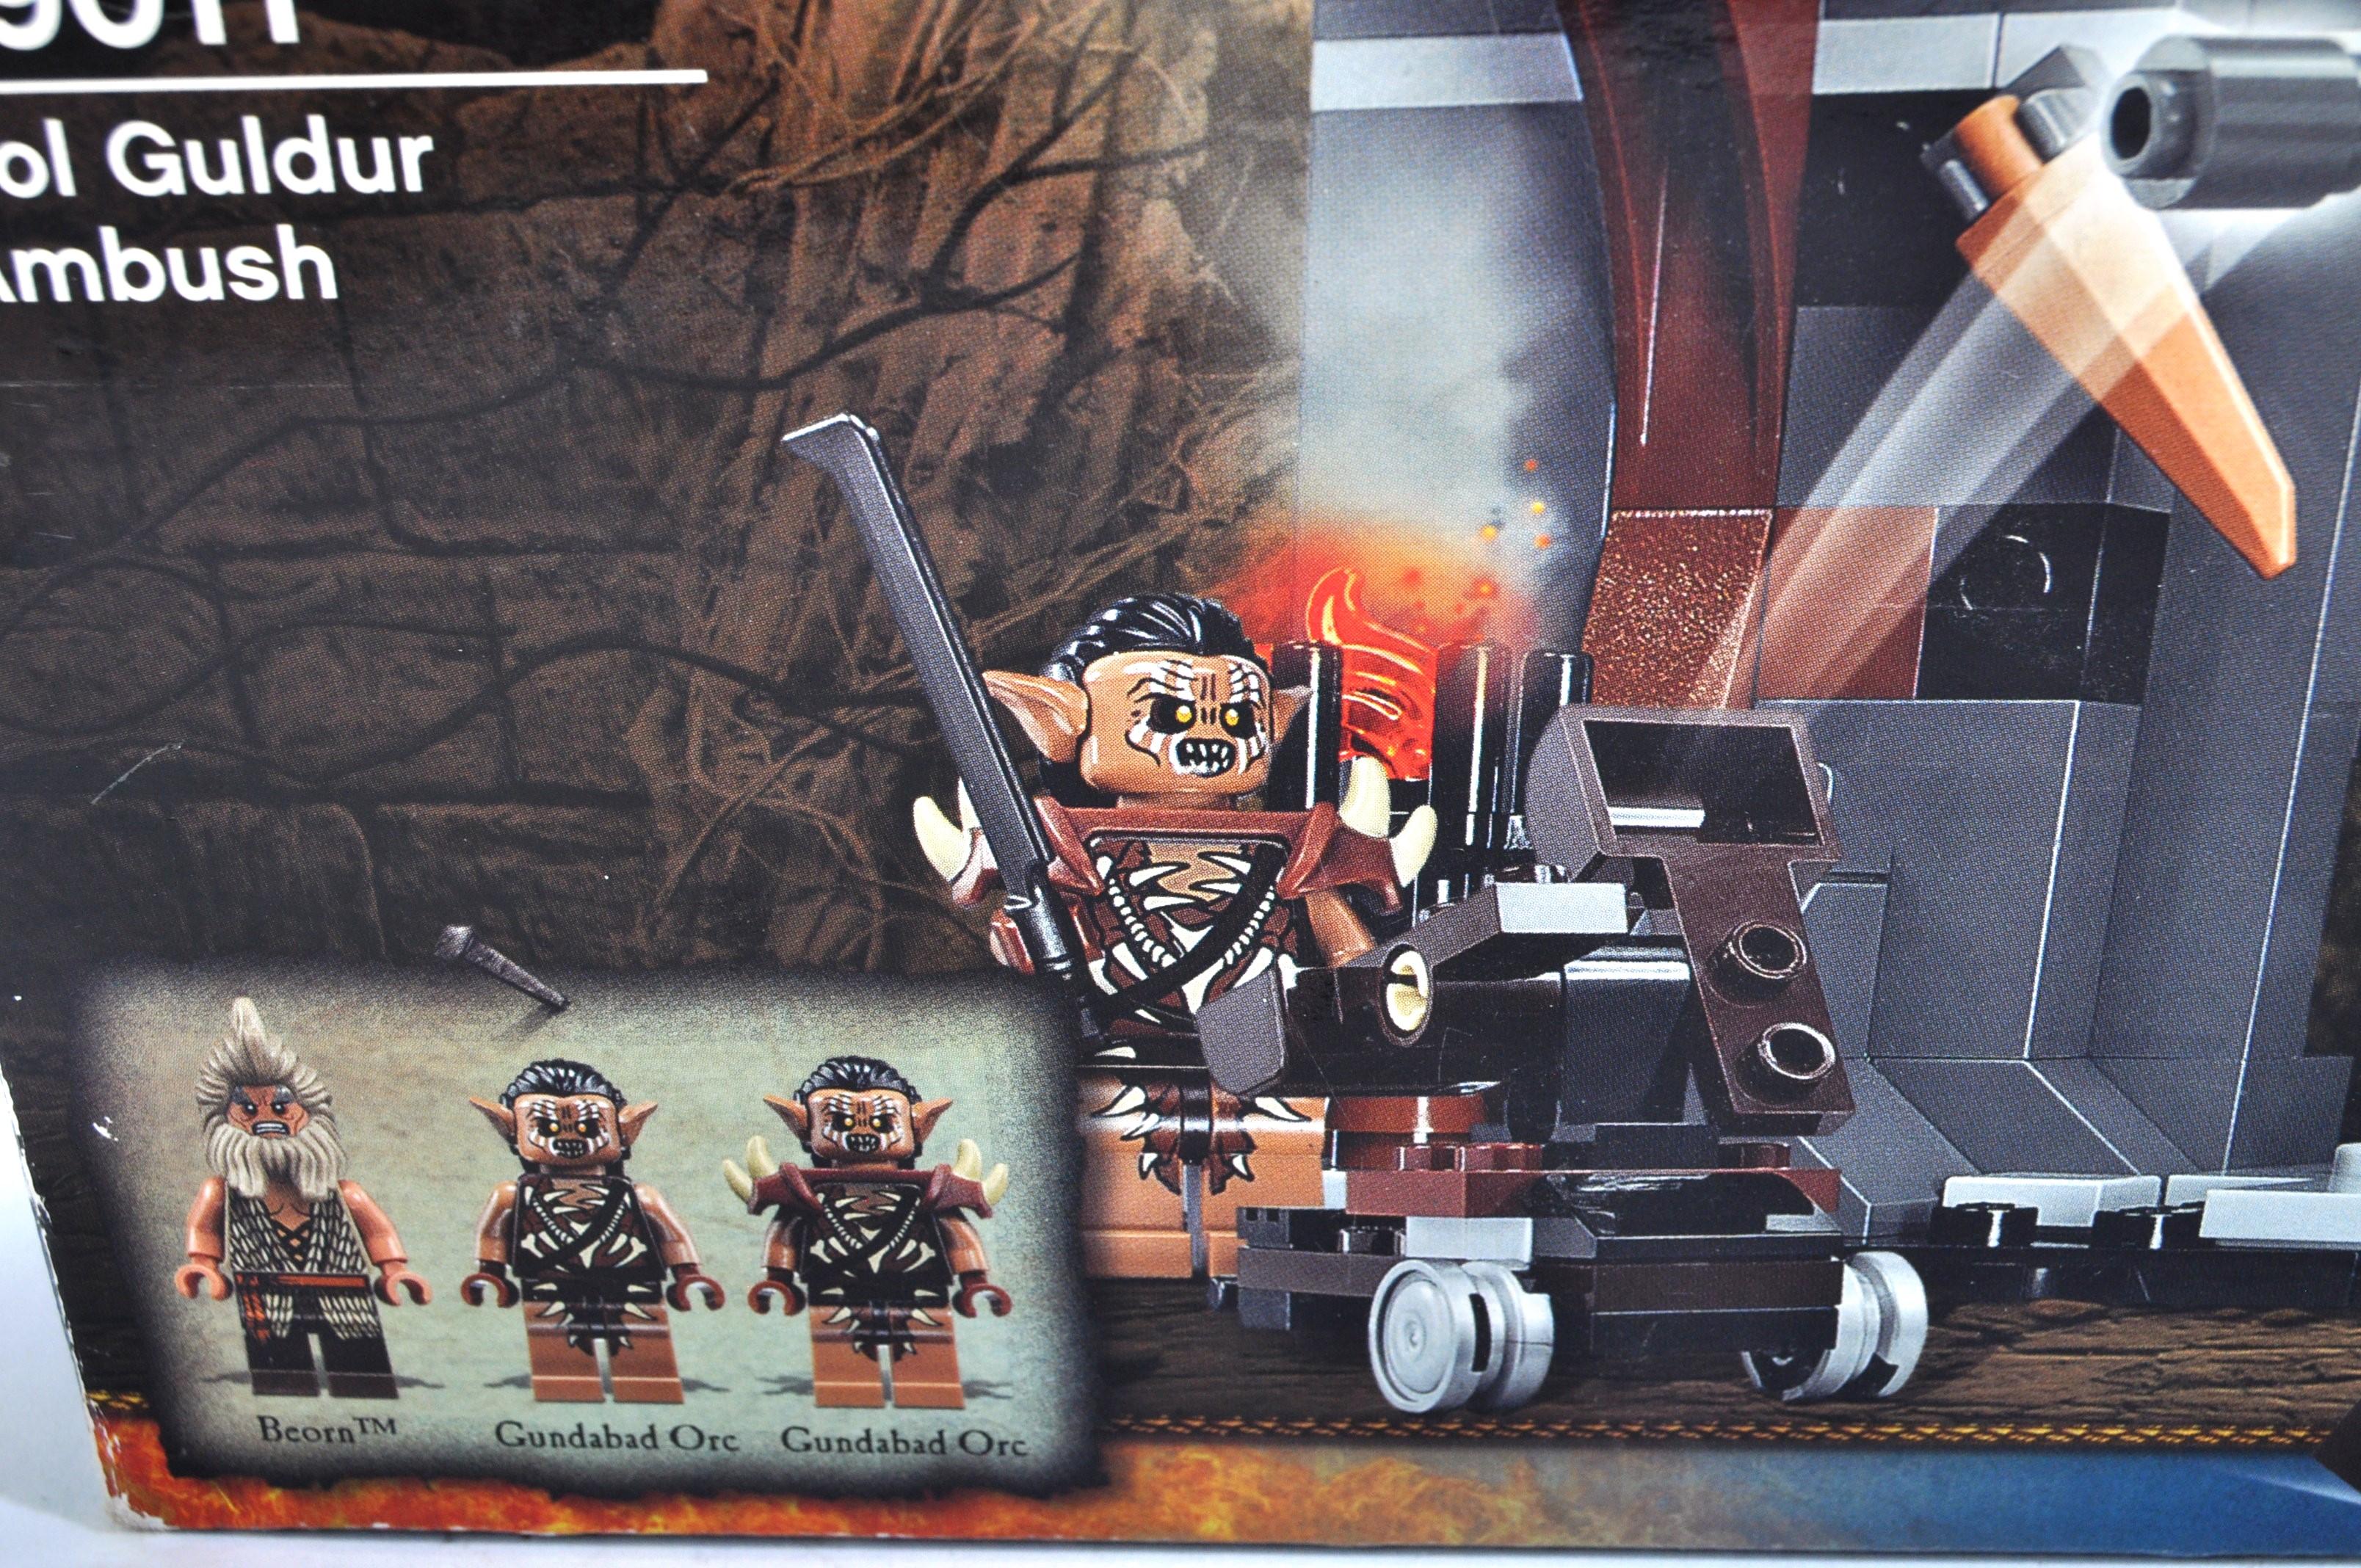 LEGO SETS - THE HOBBIT - 79000 / 79011 - Image 6 of 7